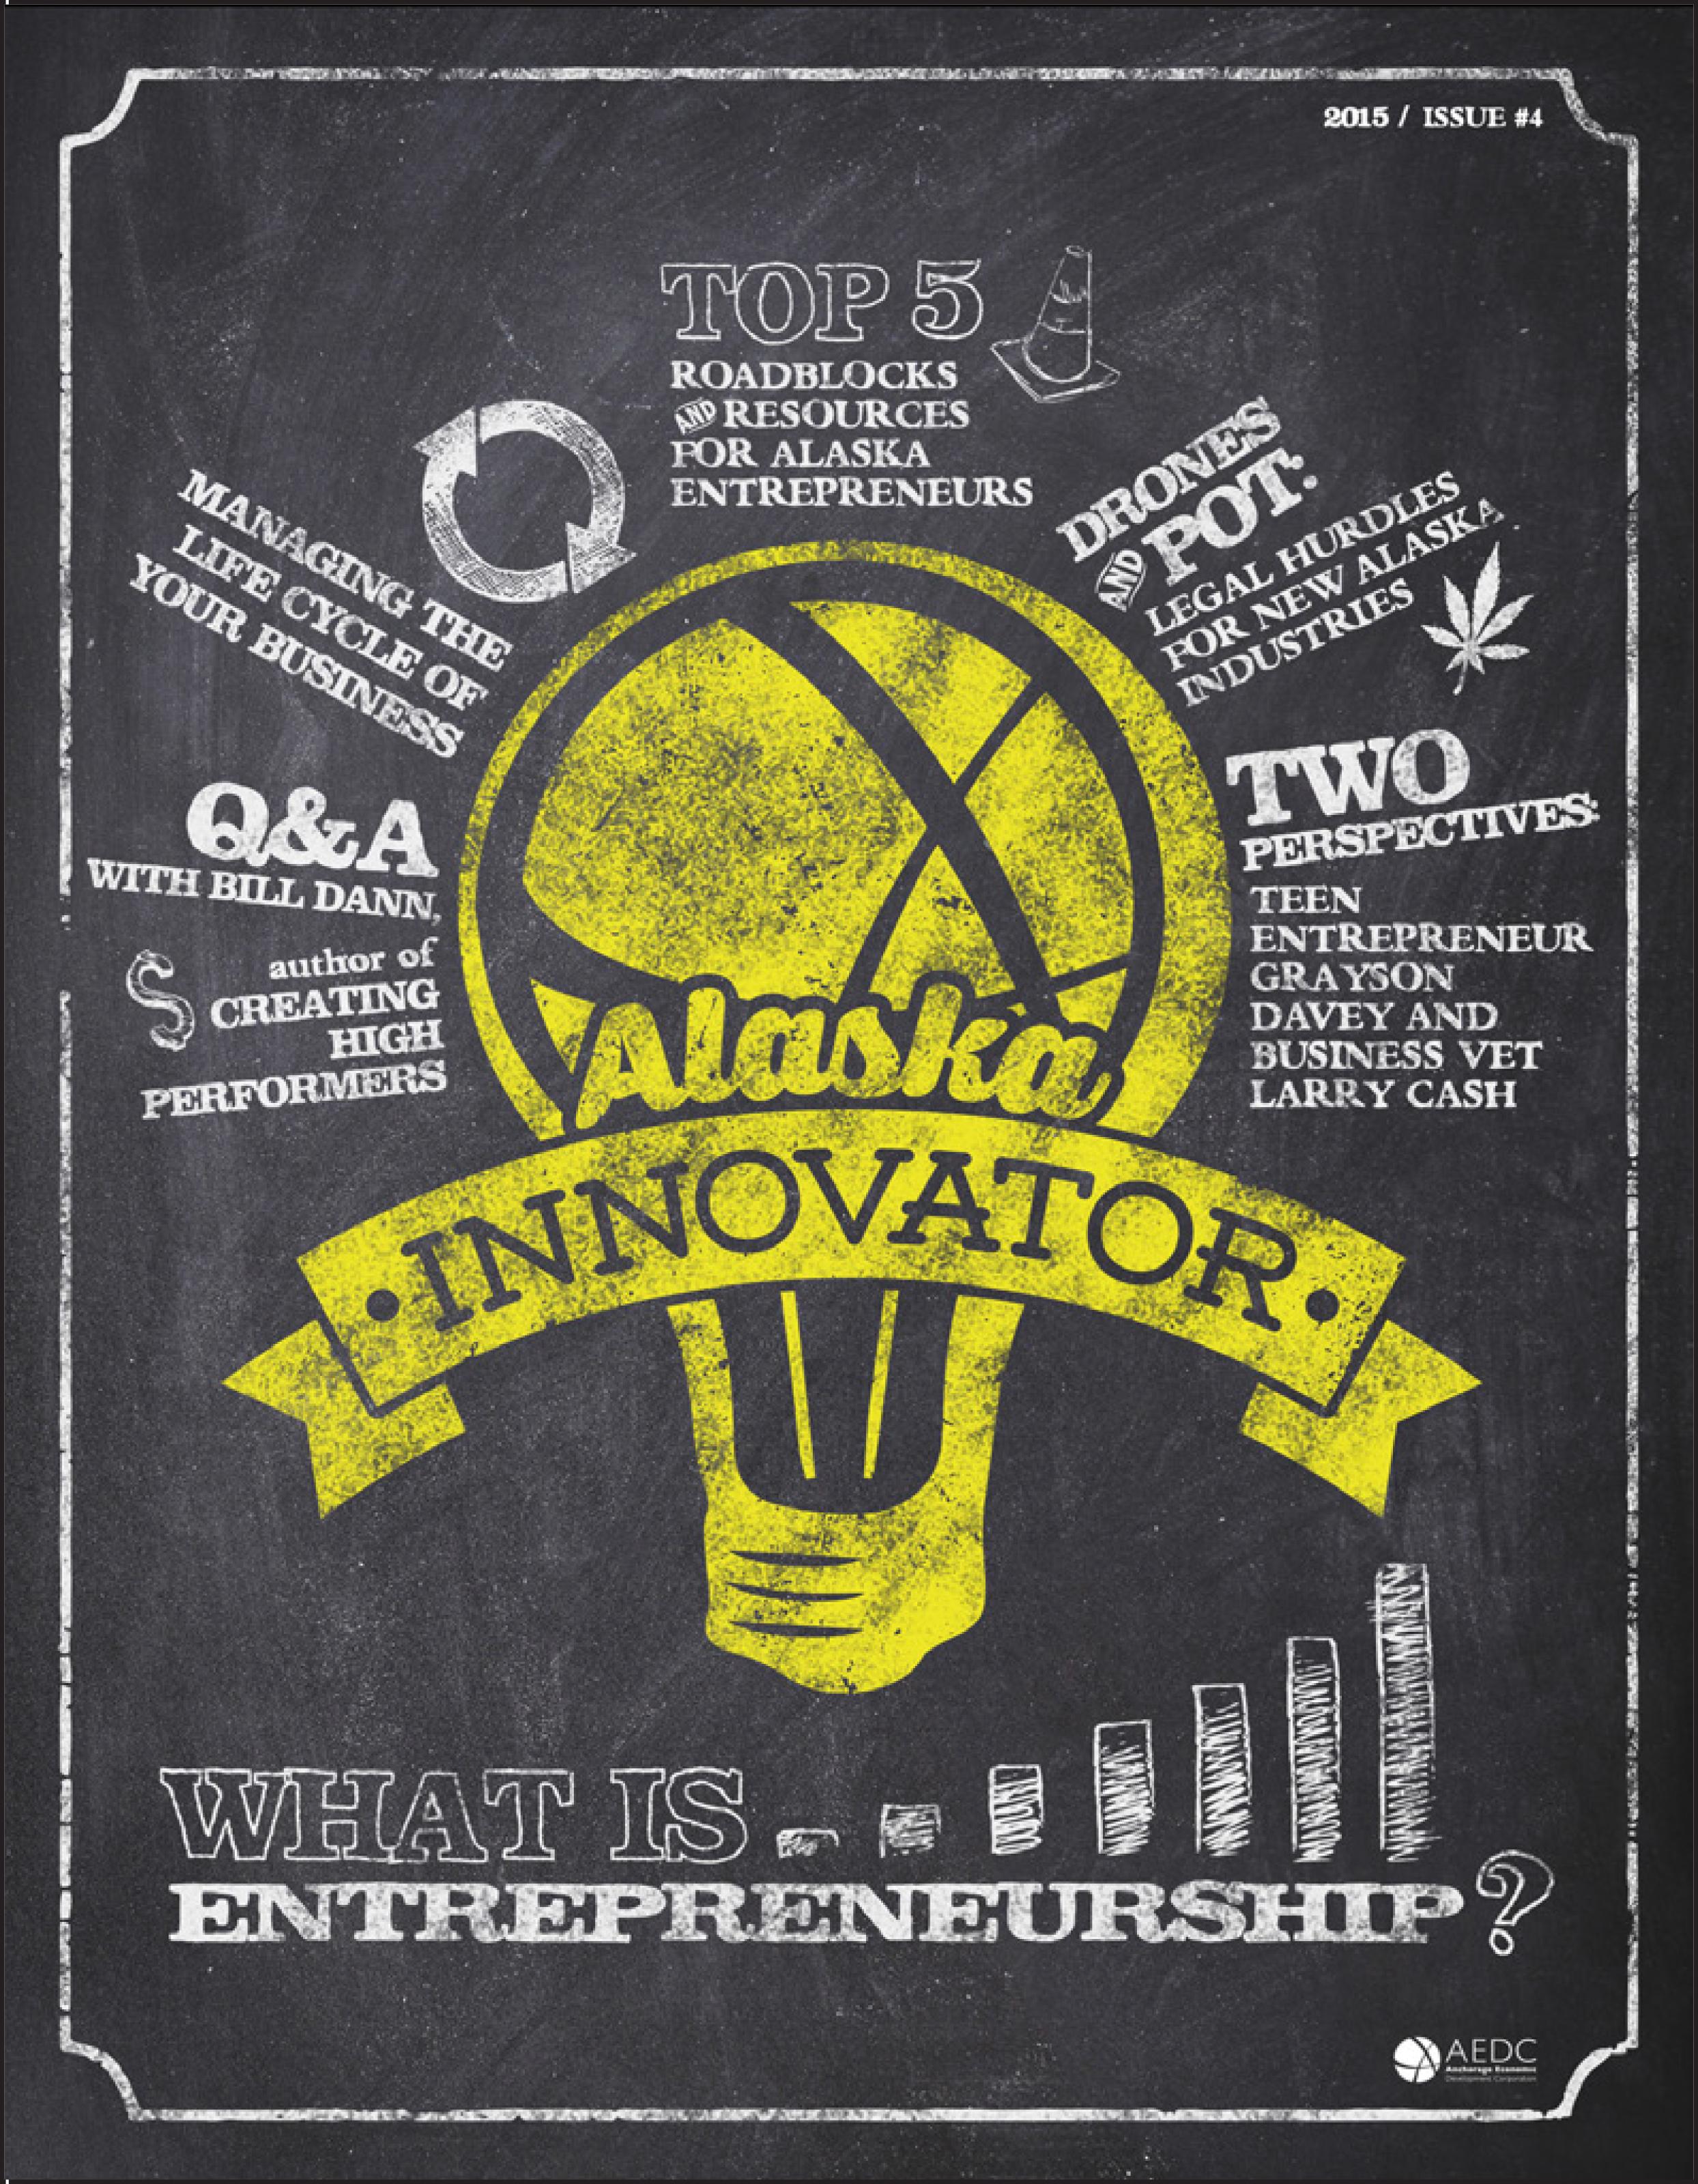 2015-Innovator-Cover